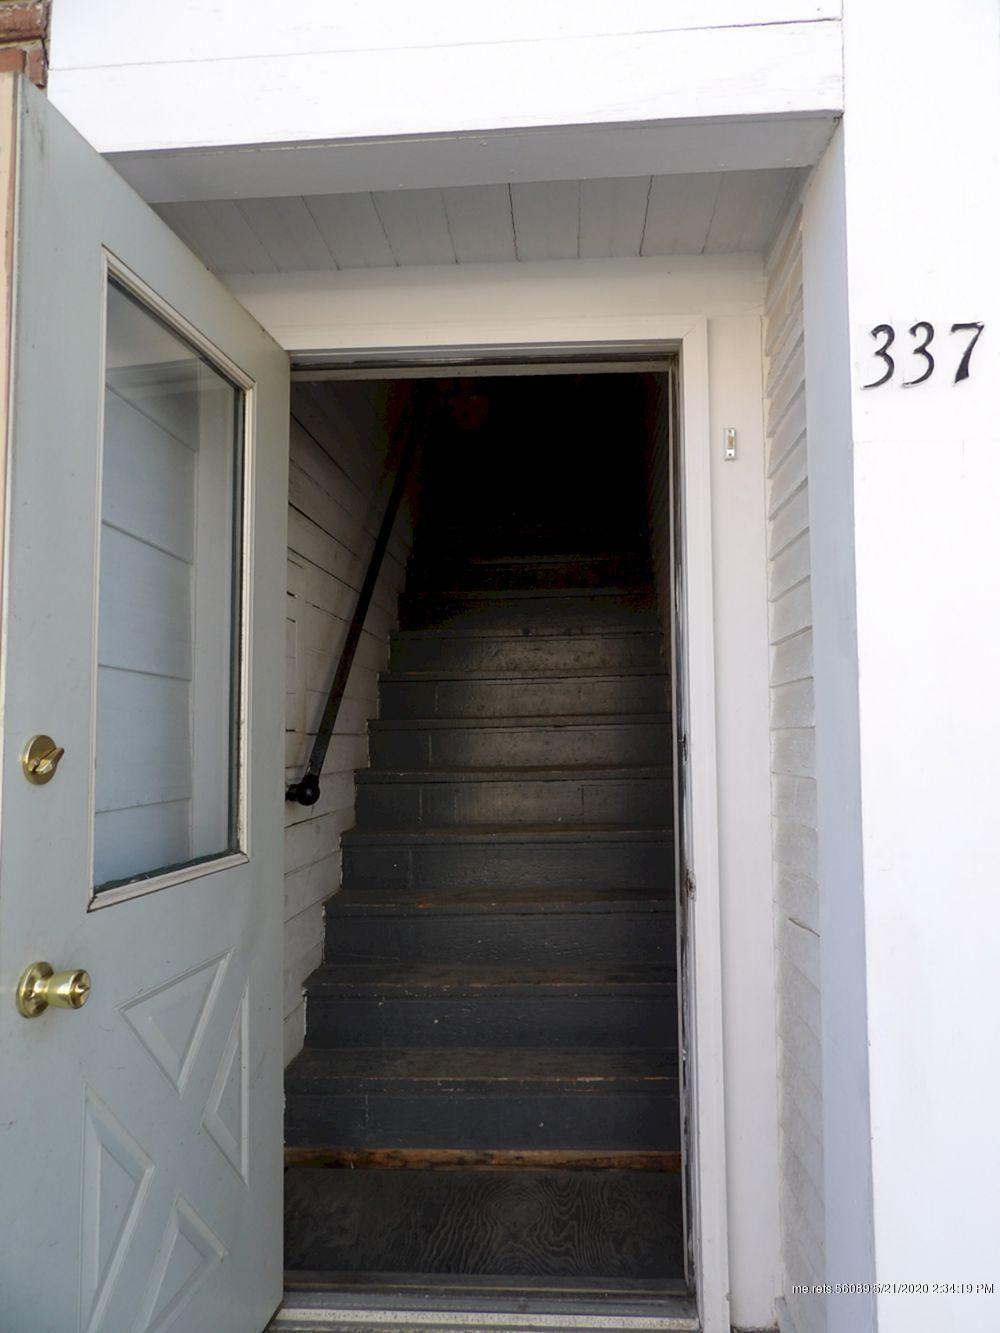 Photo of 337 Main Street, Bingham, ME 04920 (MLS # 1453116)